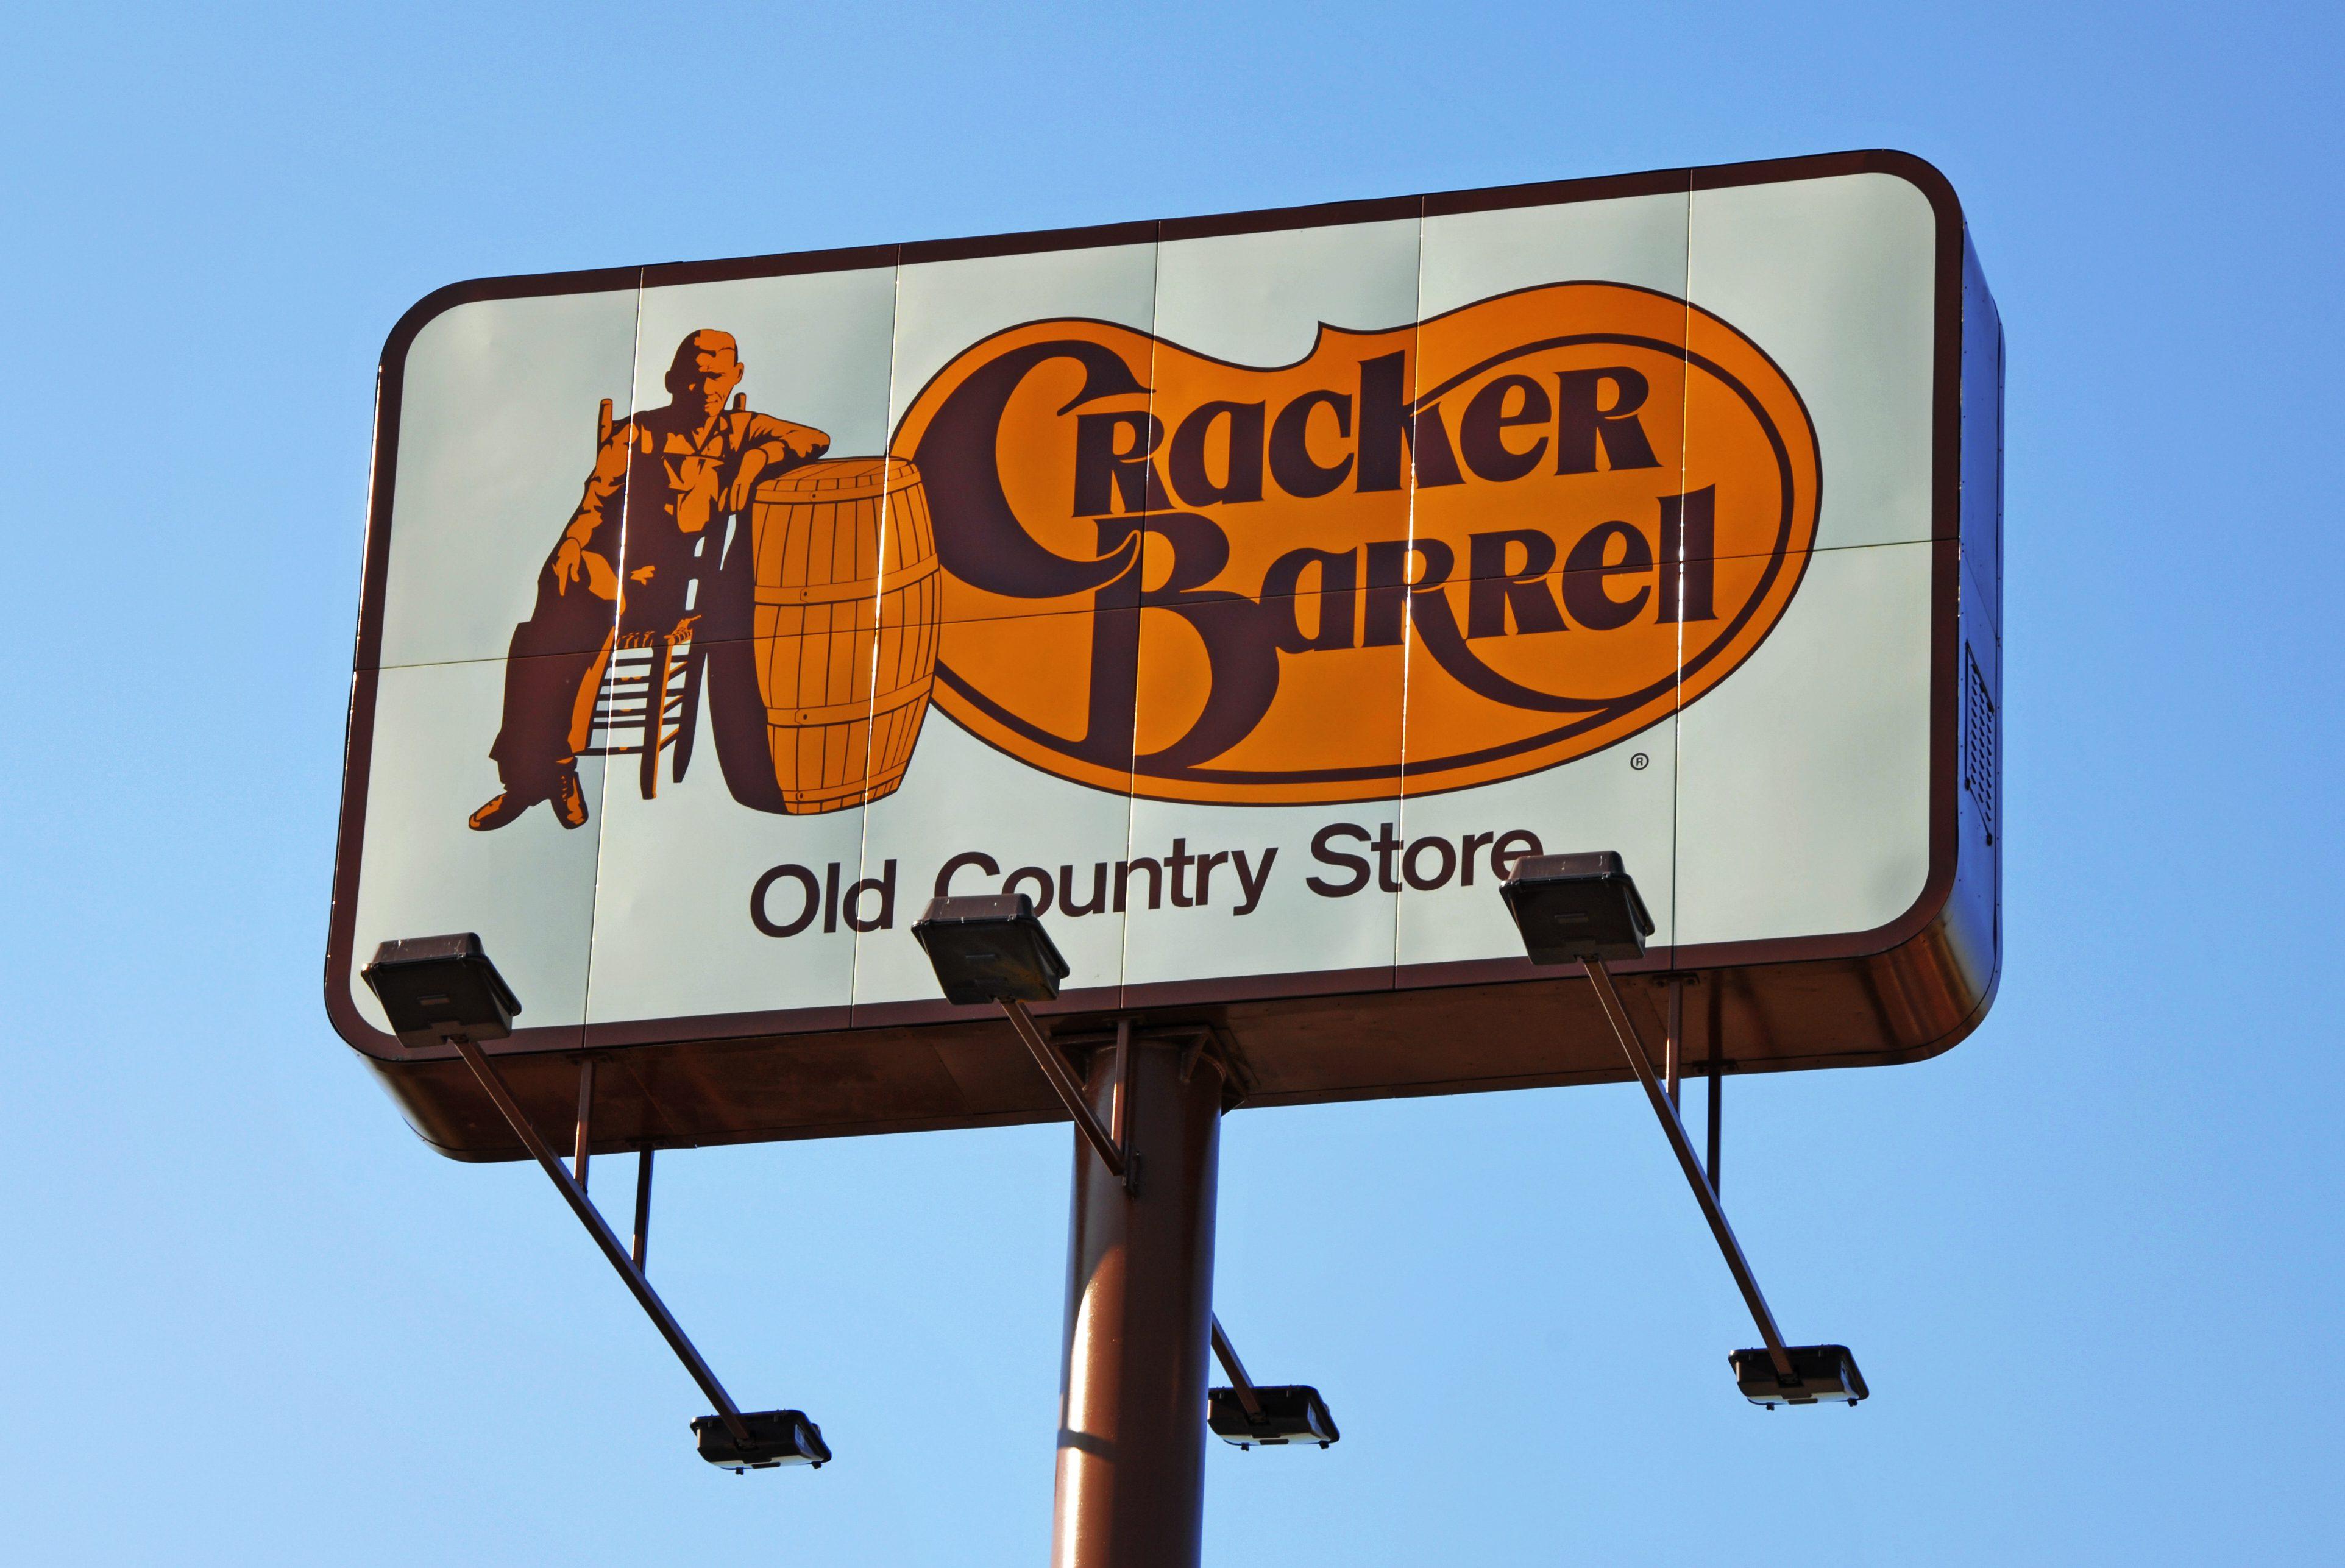 The Don'ts of Cracker Barrel RV Camping